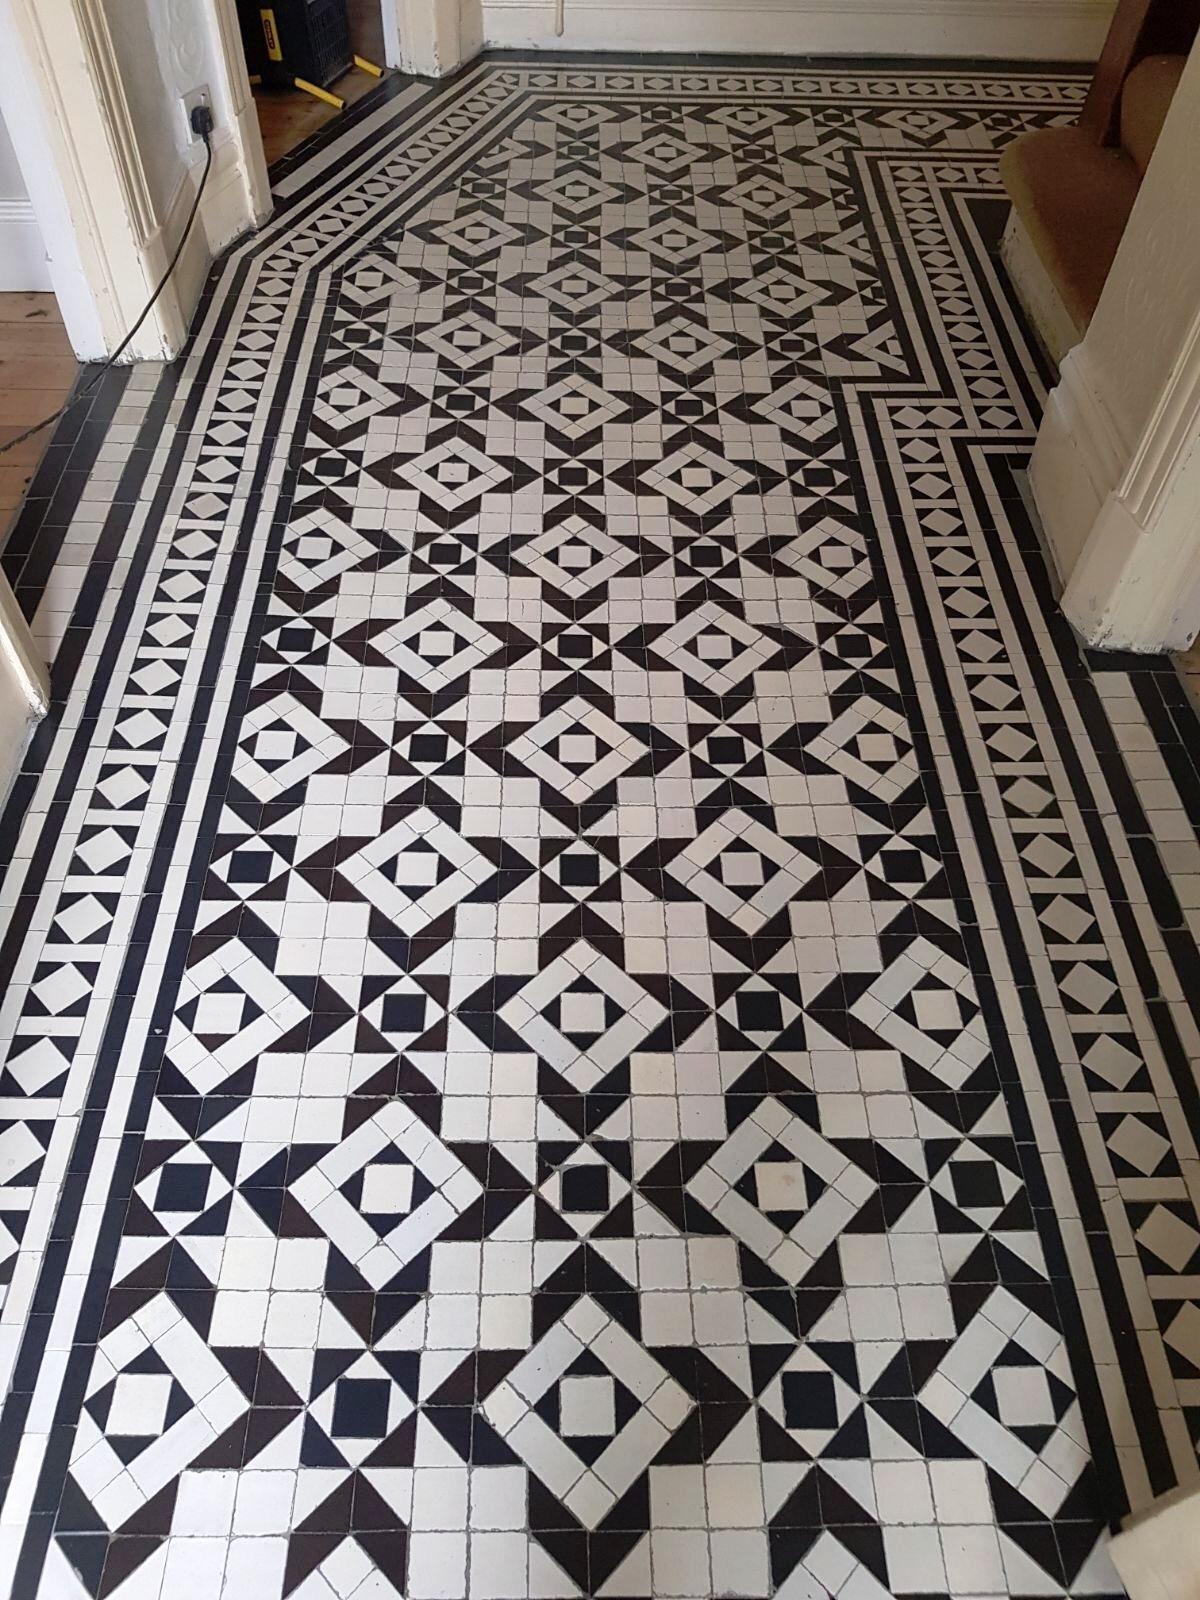 Victorian Tiled Hallway Floor After Full Restoration in Woodford Green